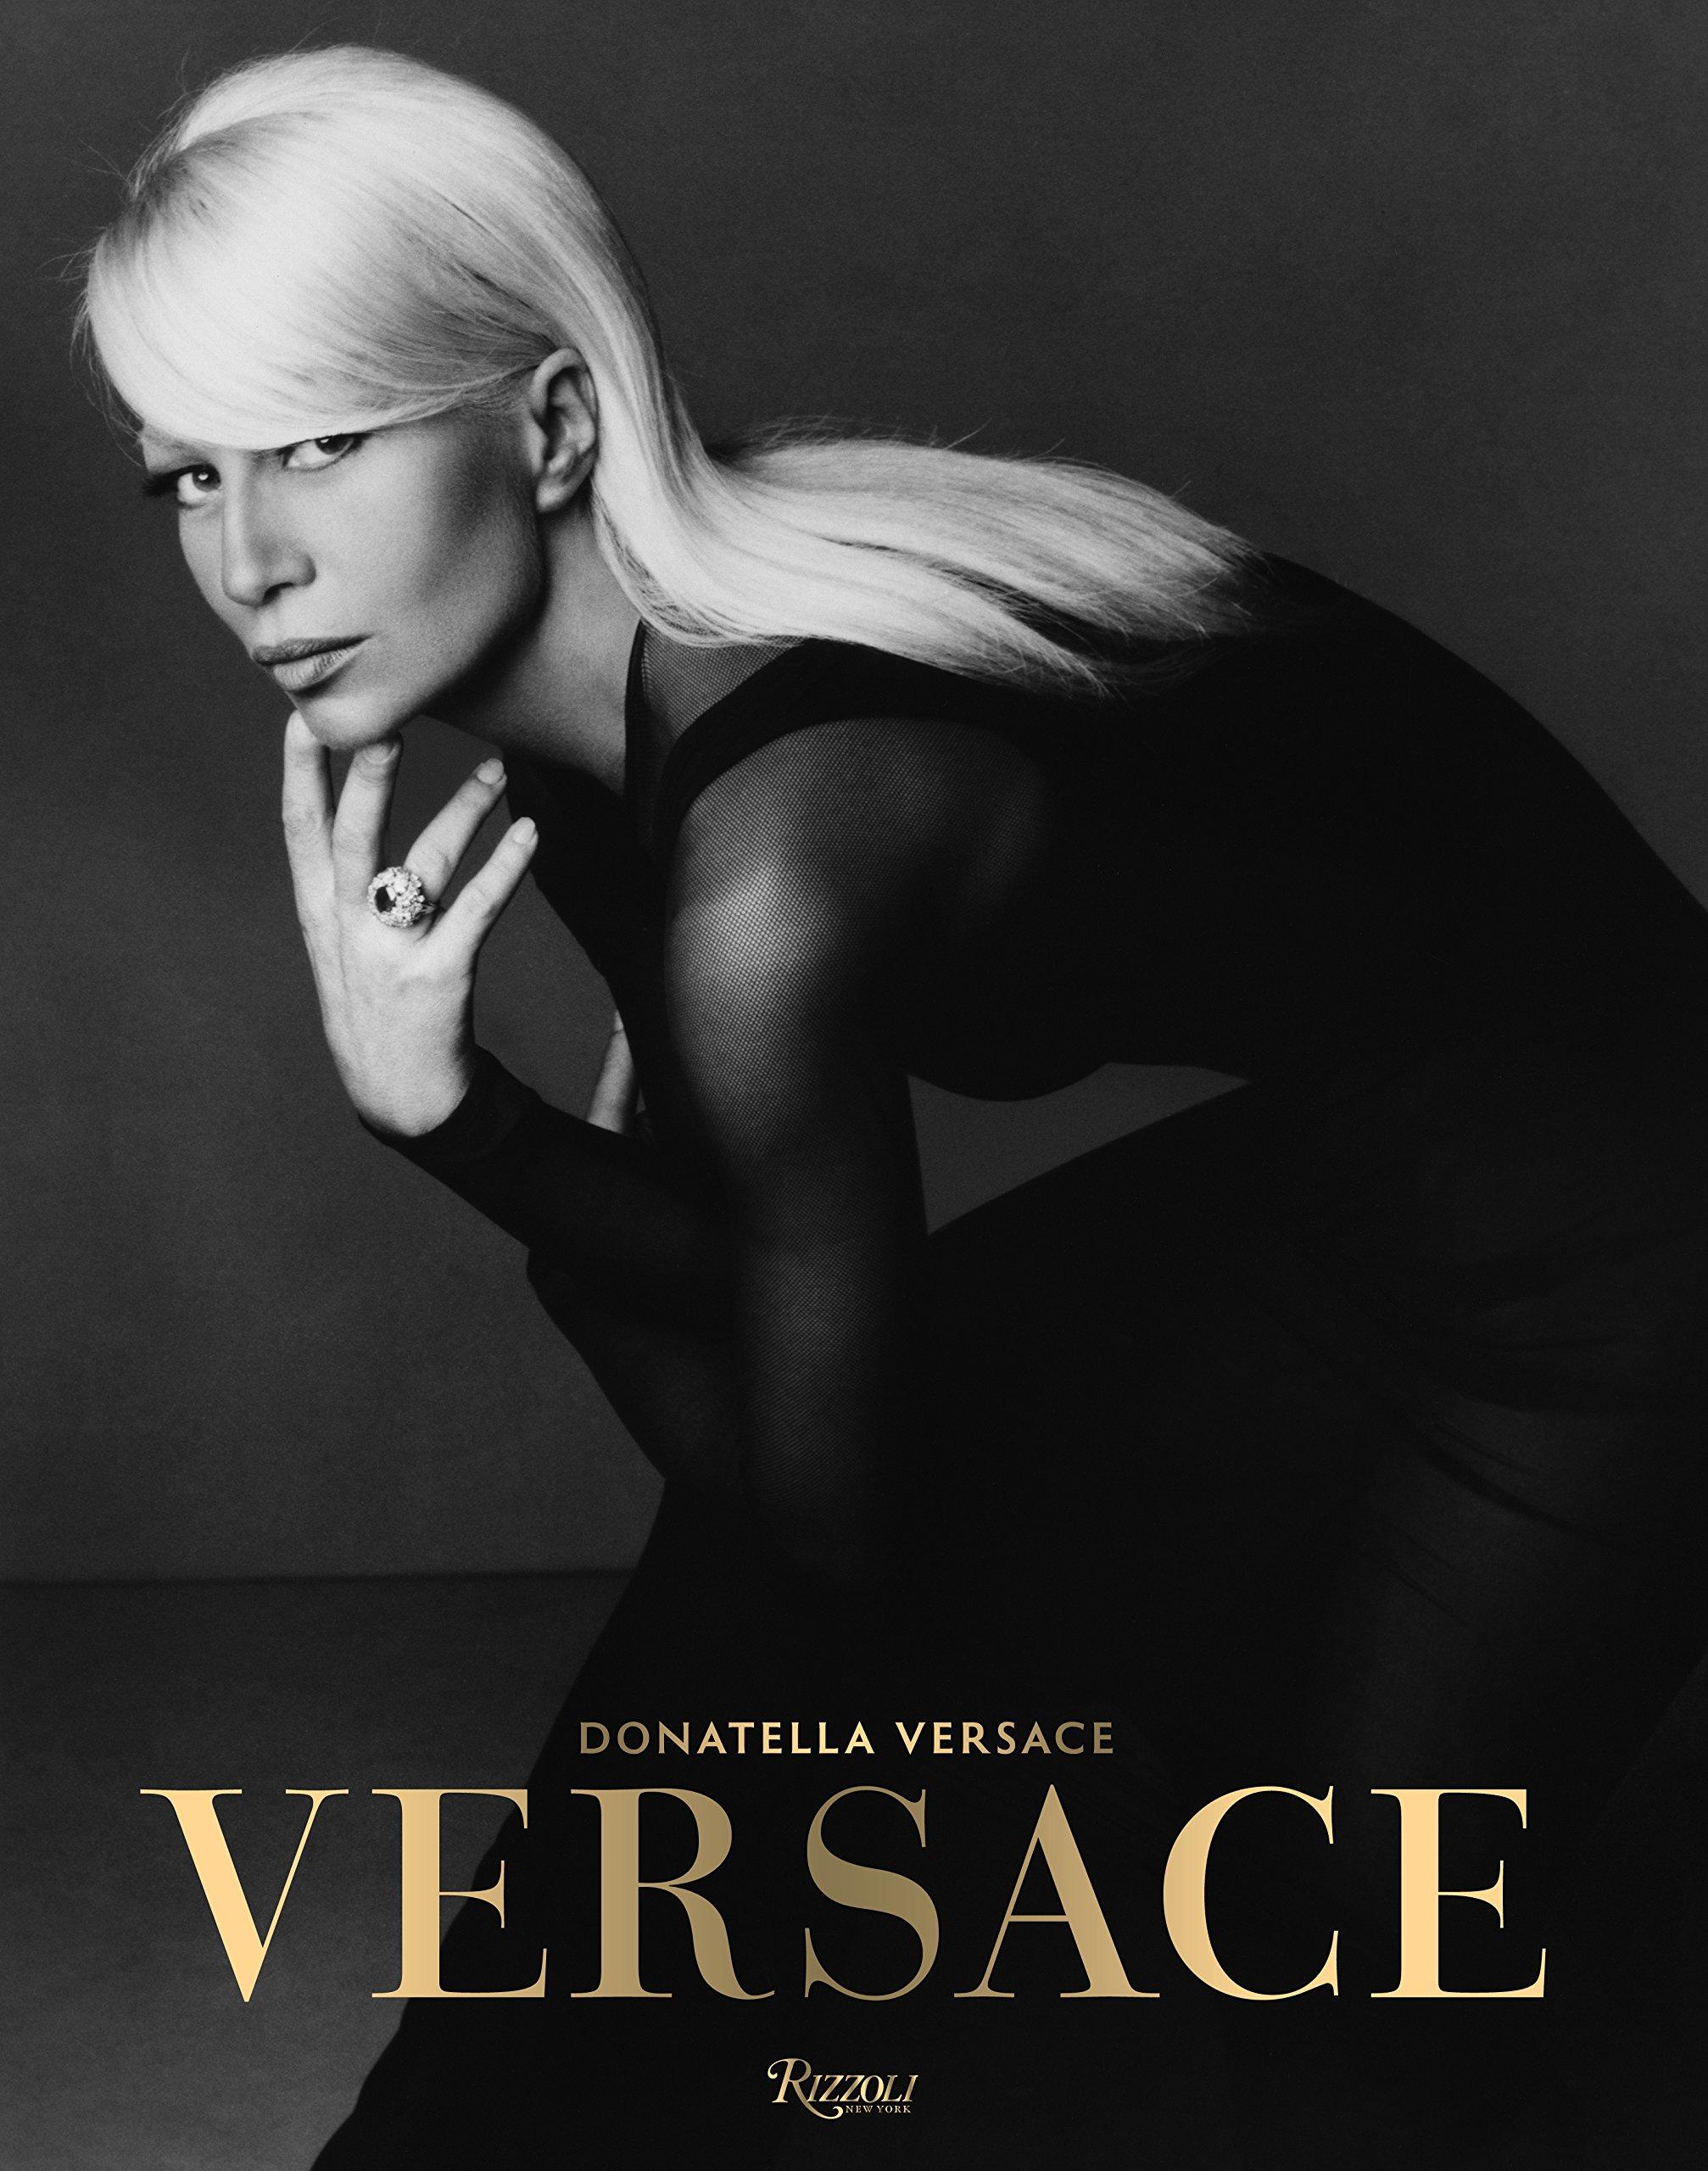 Versace Donatella Versace Maria Luisa Frisa Stefano Tonchi Tim